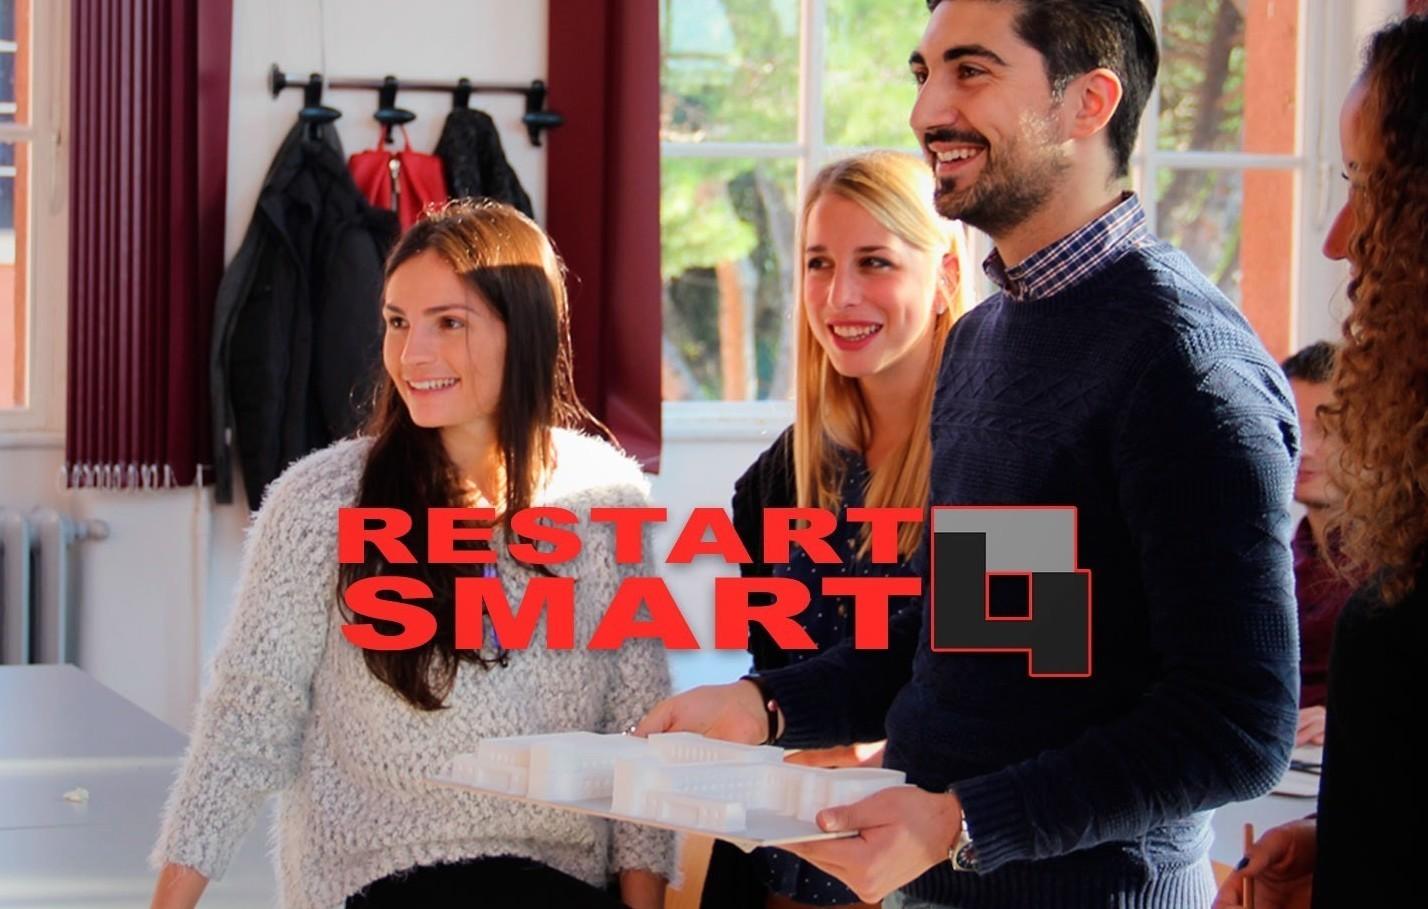 La casa del futuro ReStart4Smart present